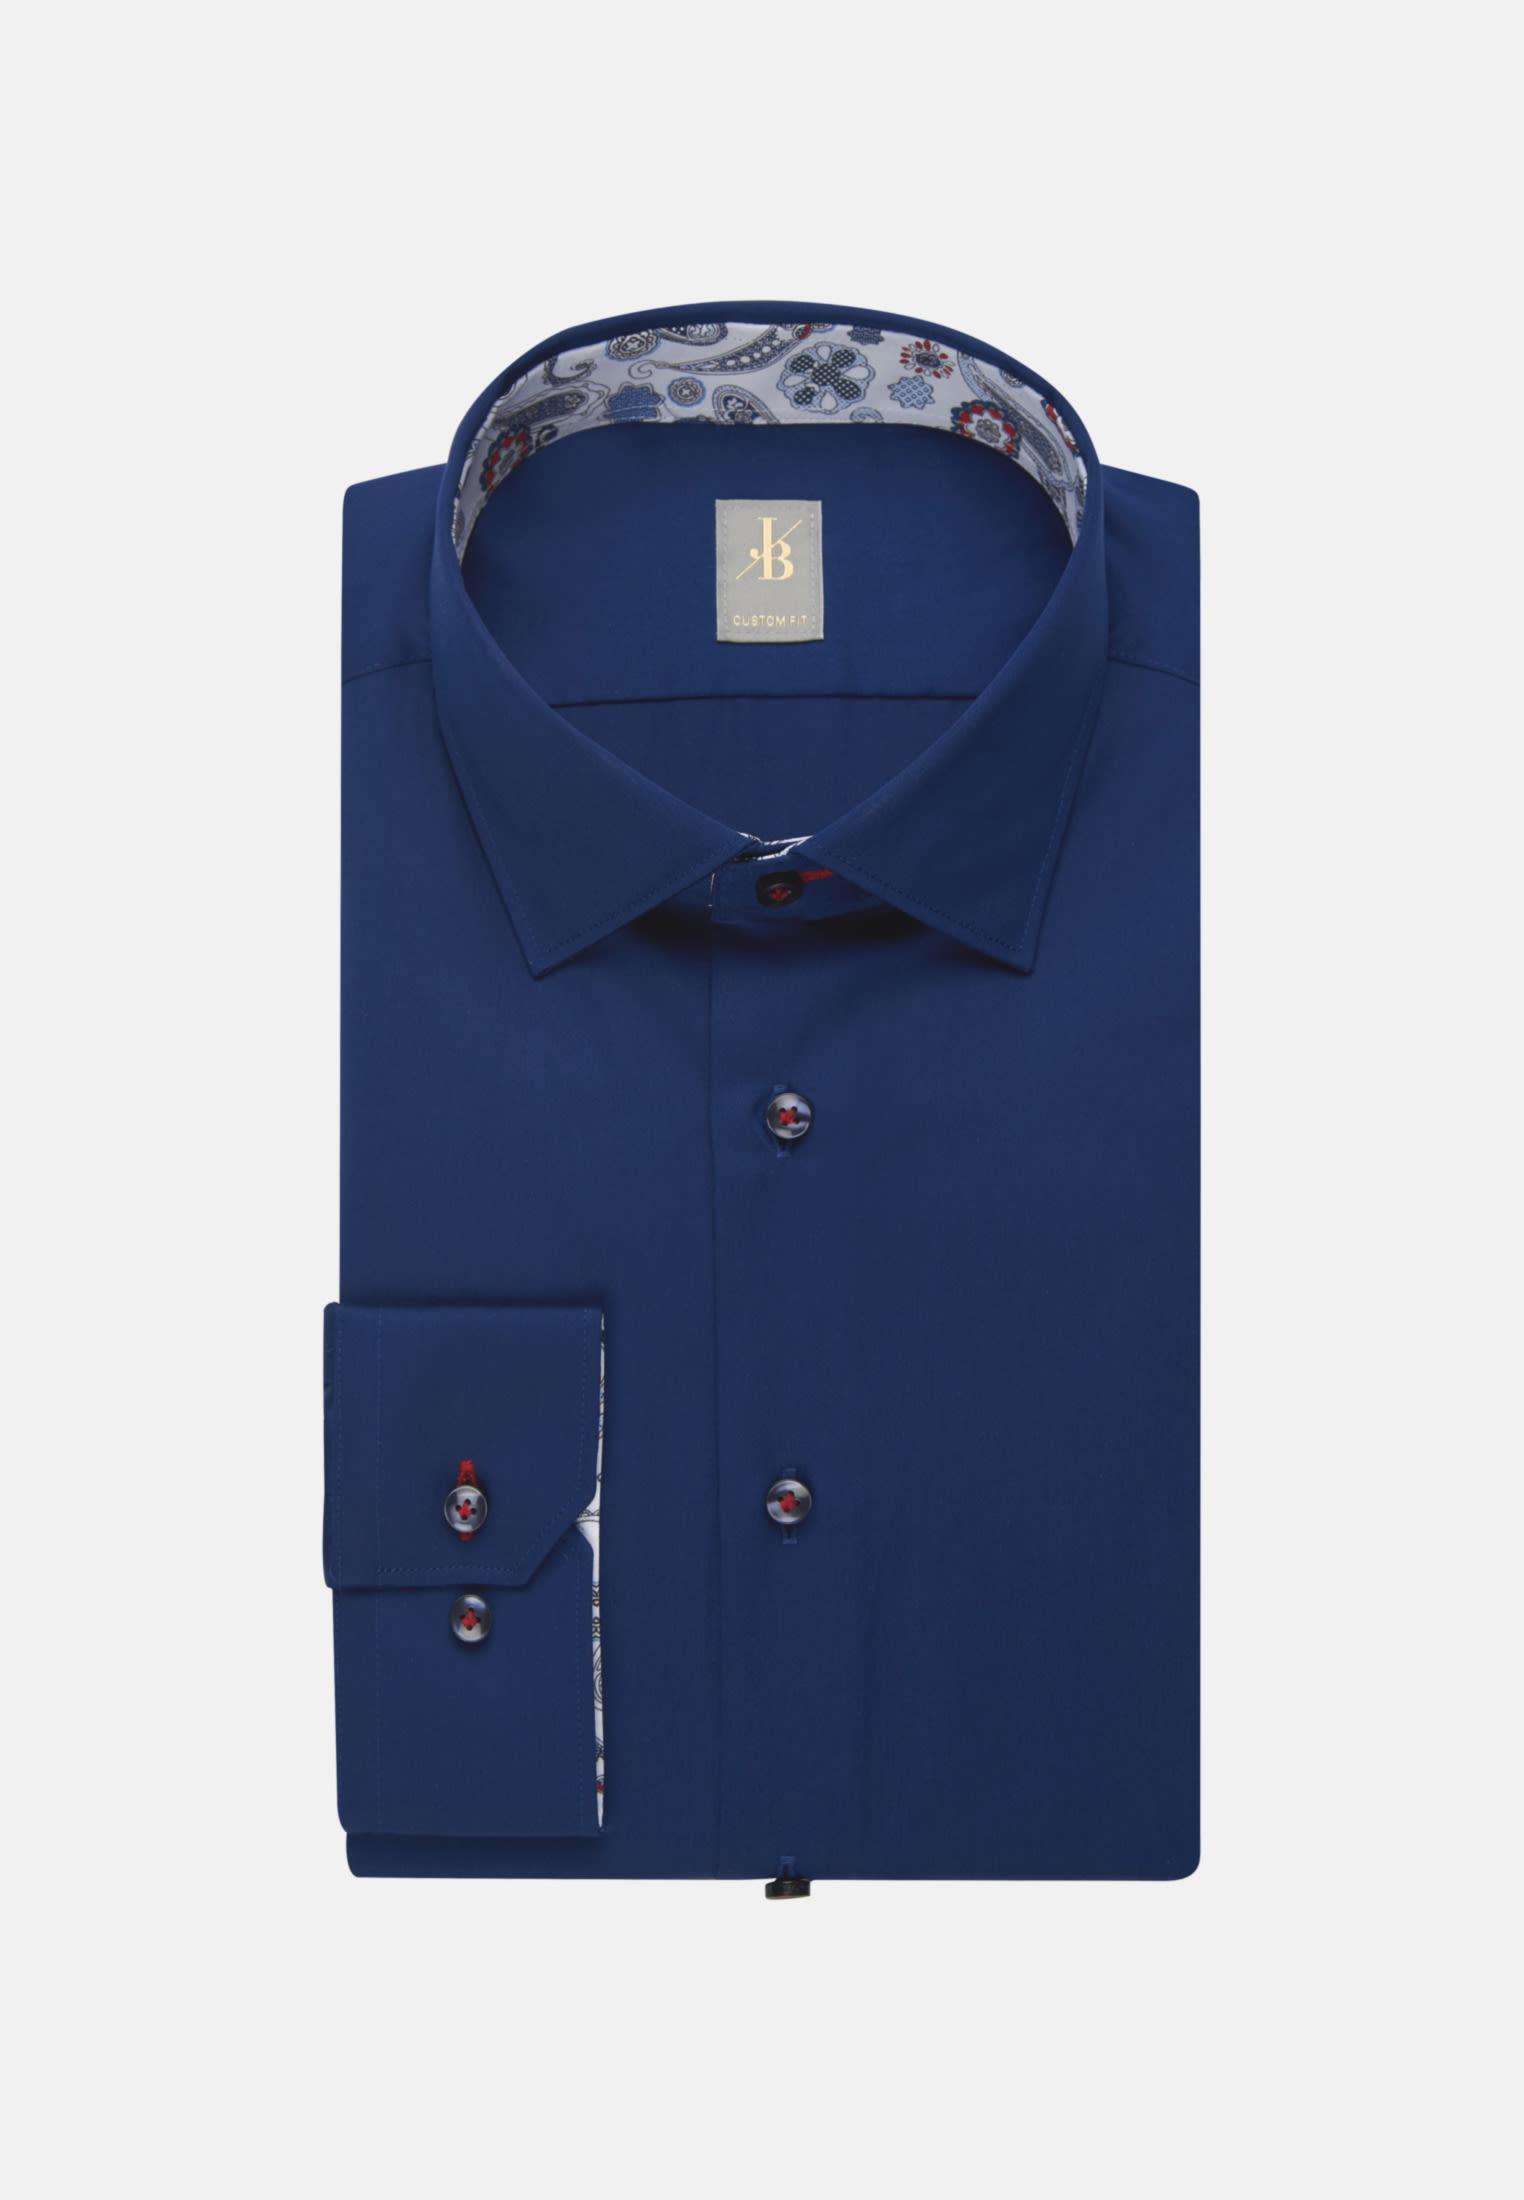 Satin Business Hemd in Custom Fit mit Kentkragen in Dunkelblau    Jacques Britt Onlineshop